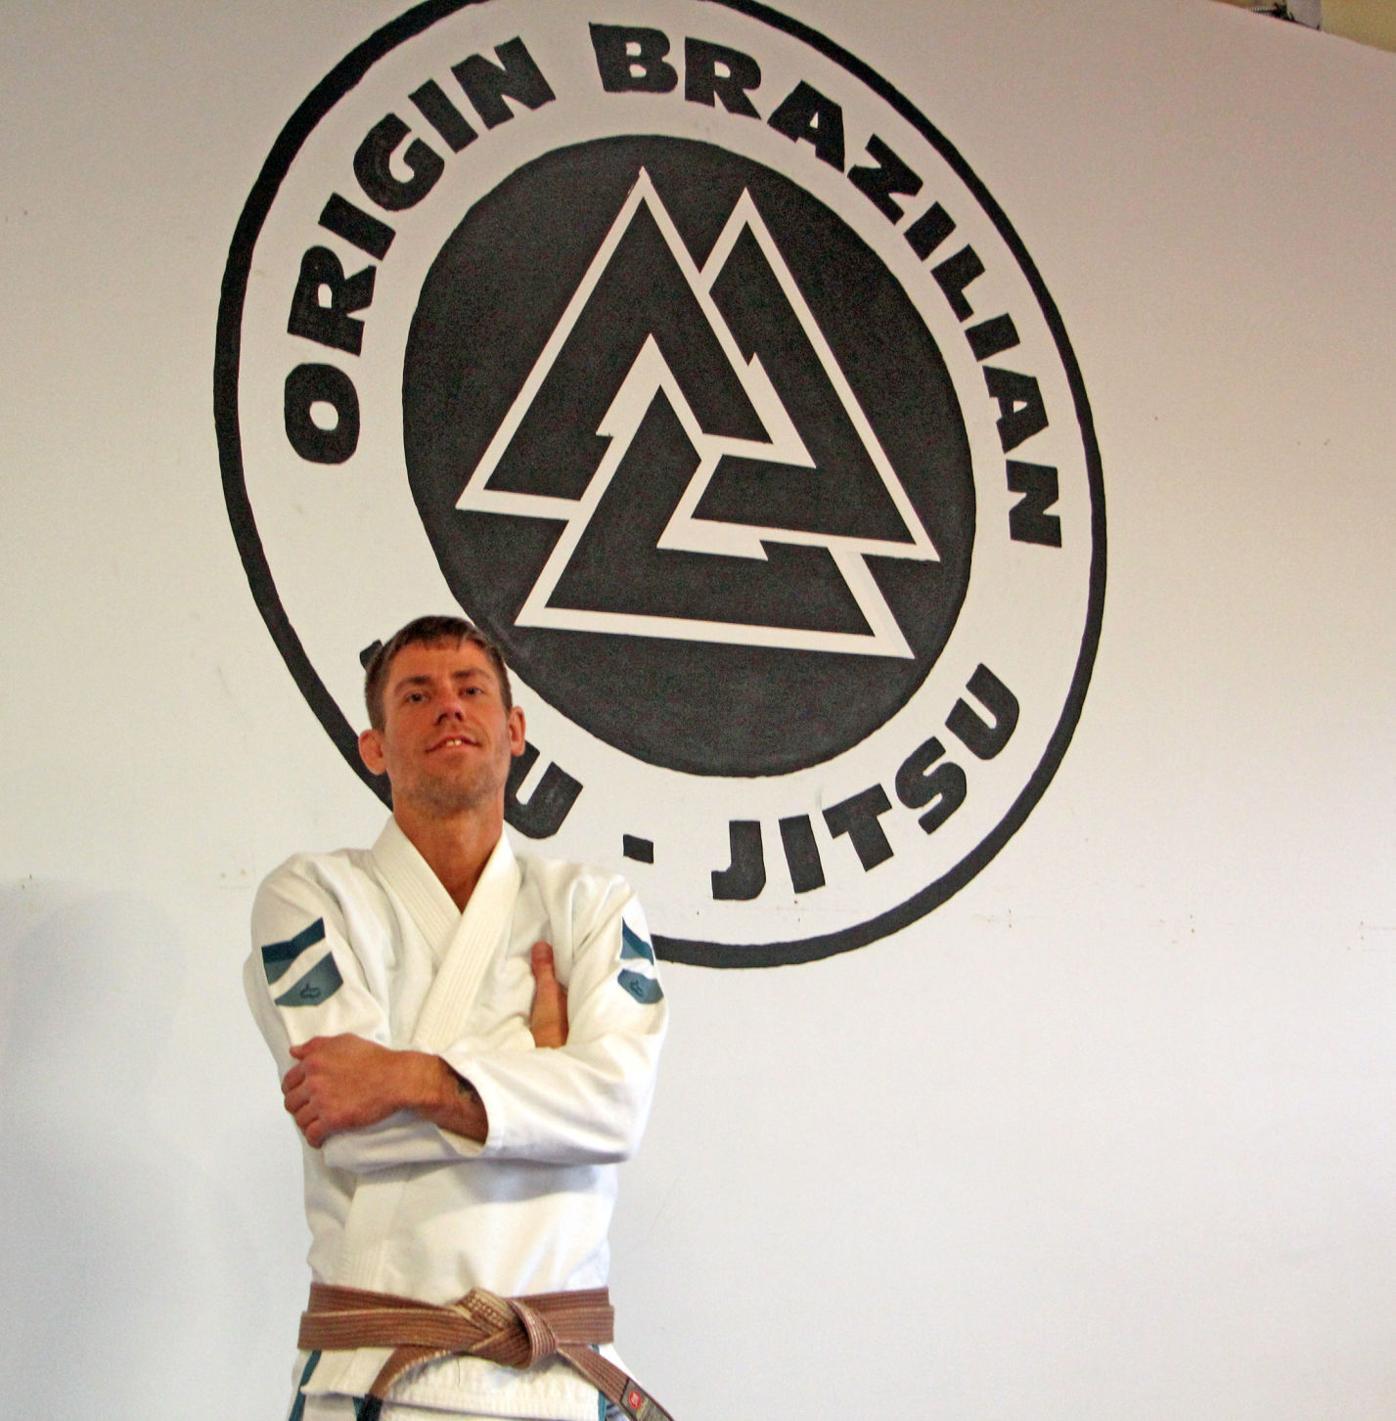 Jesse Reine Brazilian Jiu-Jitsu